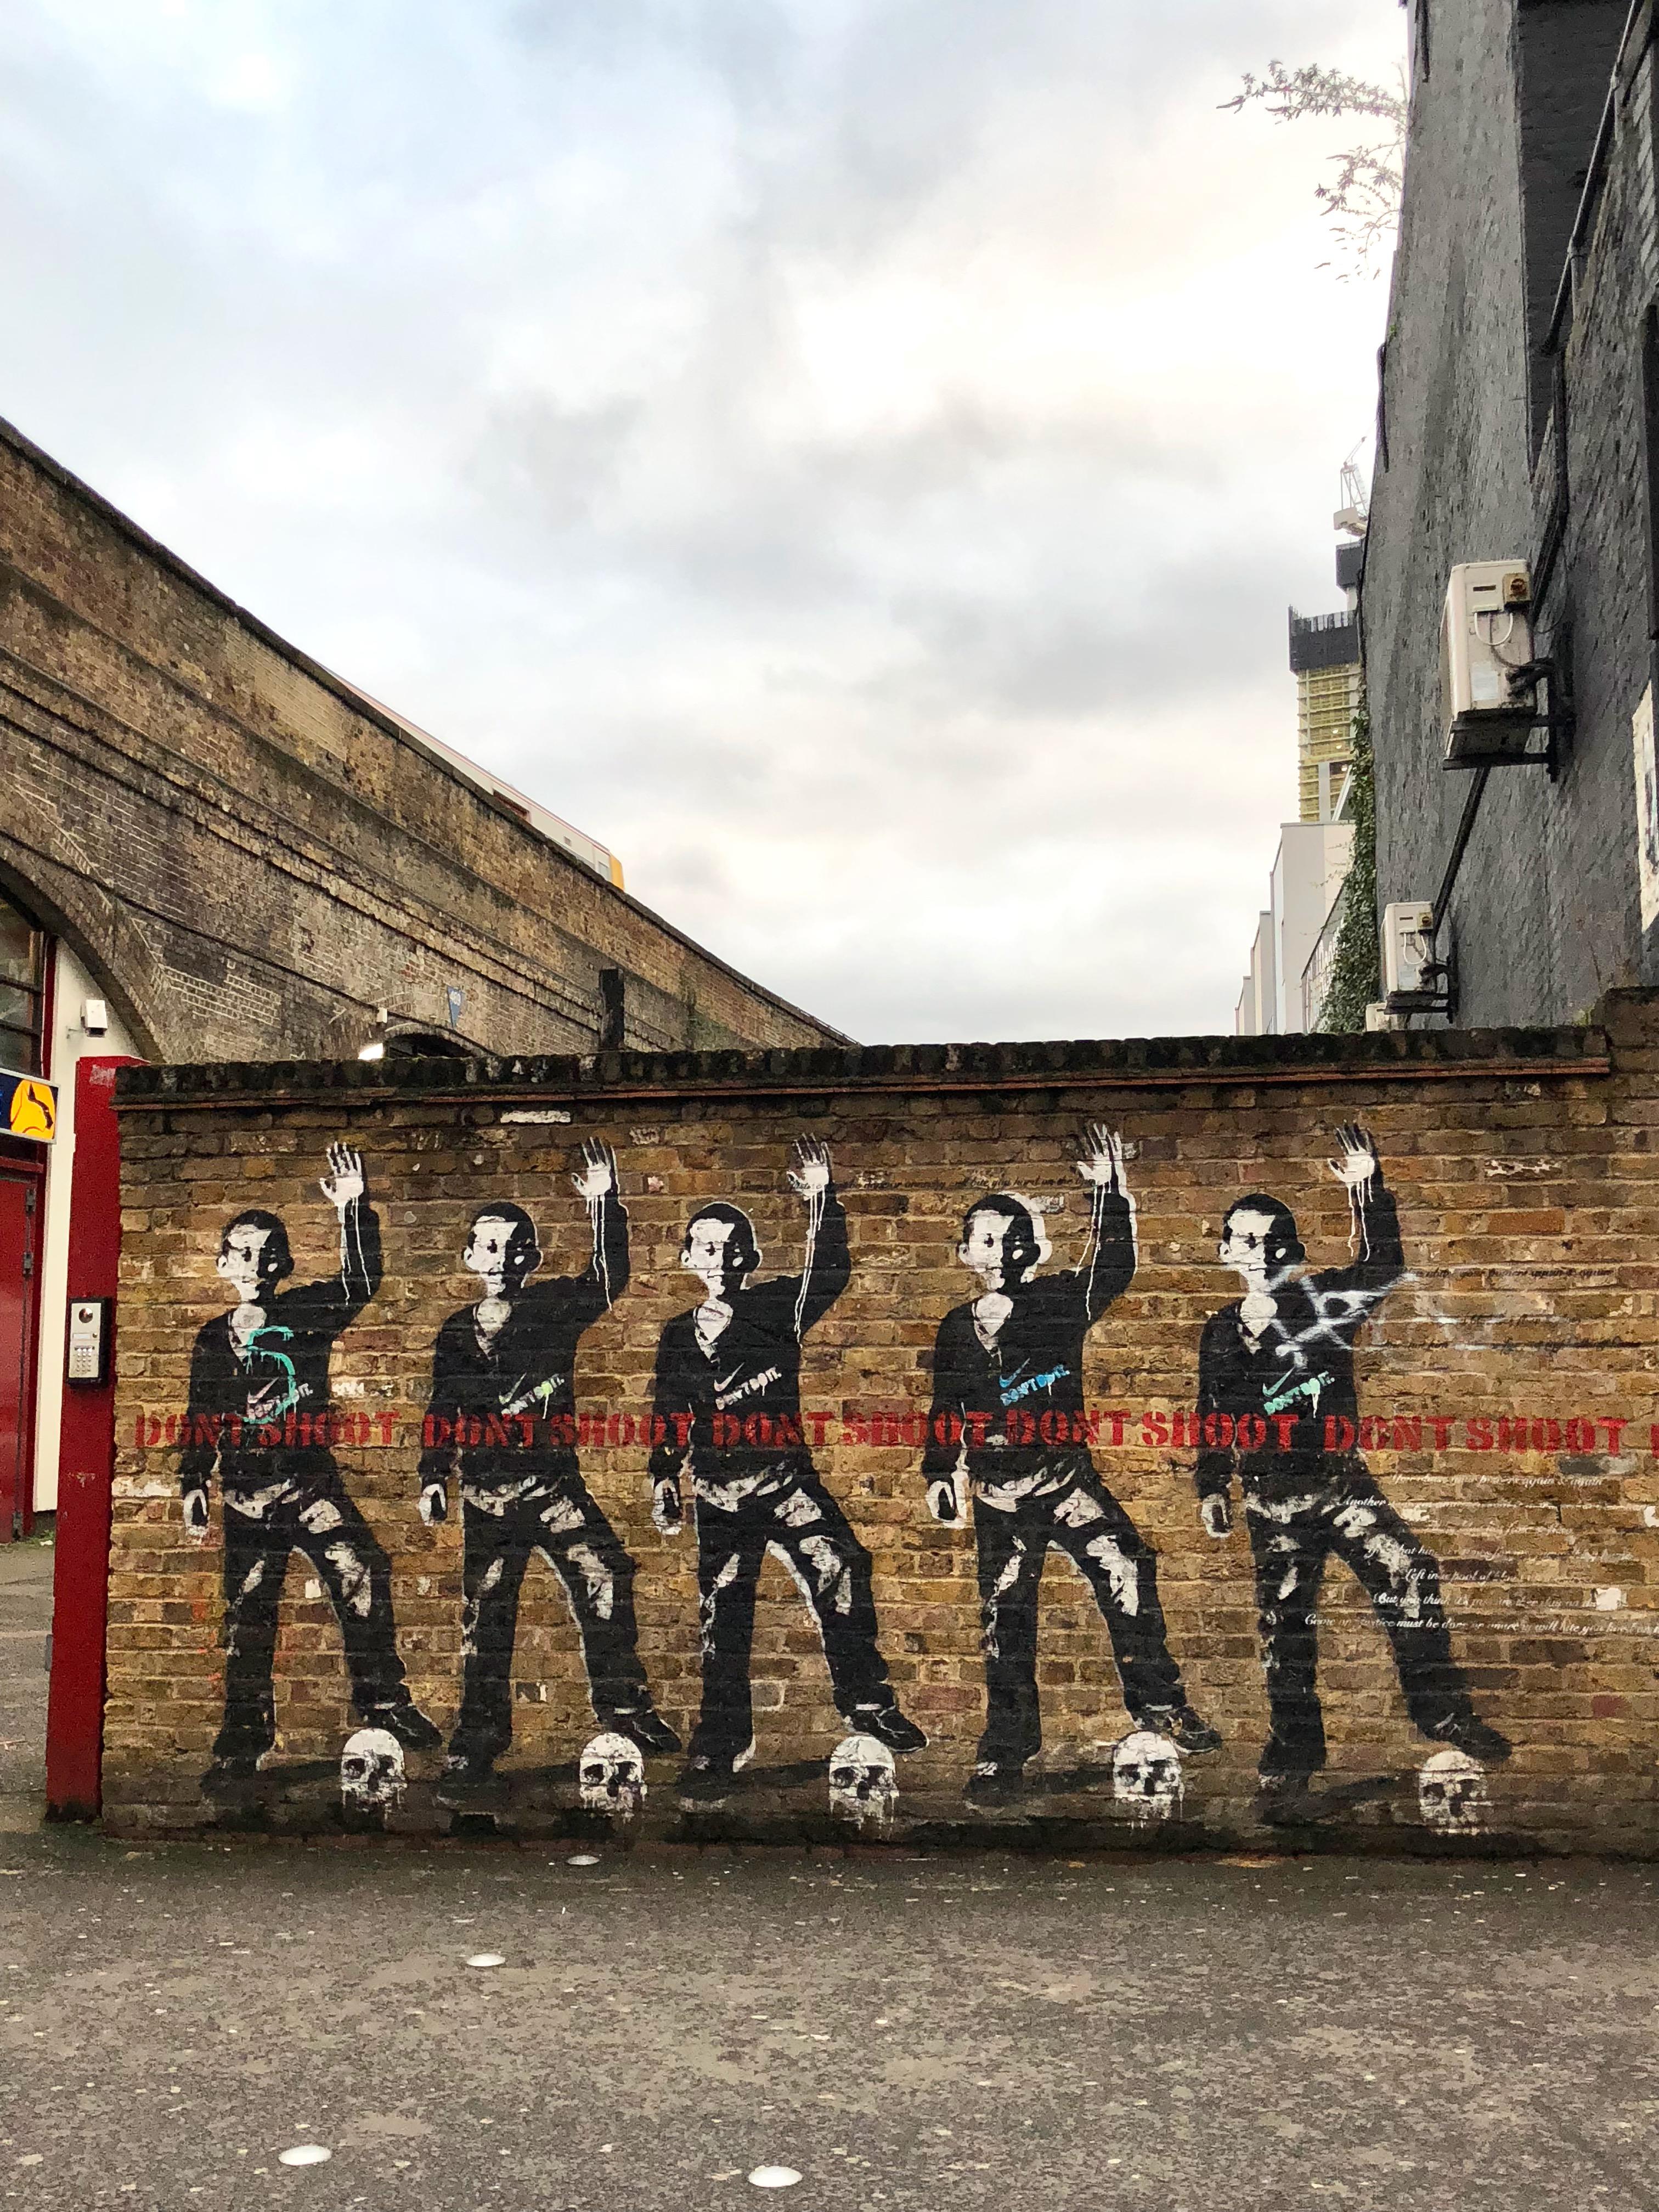 CAPAStudyAbroad_London_Spring2018_From Kelly Allen - Banksy Art